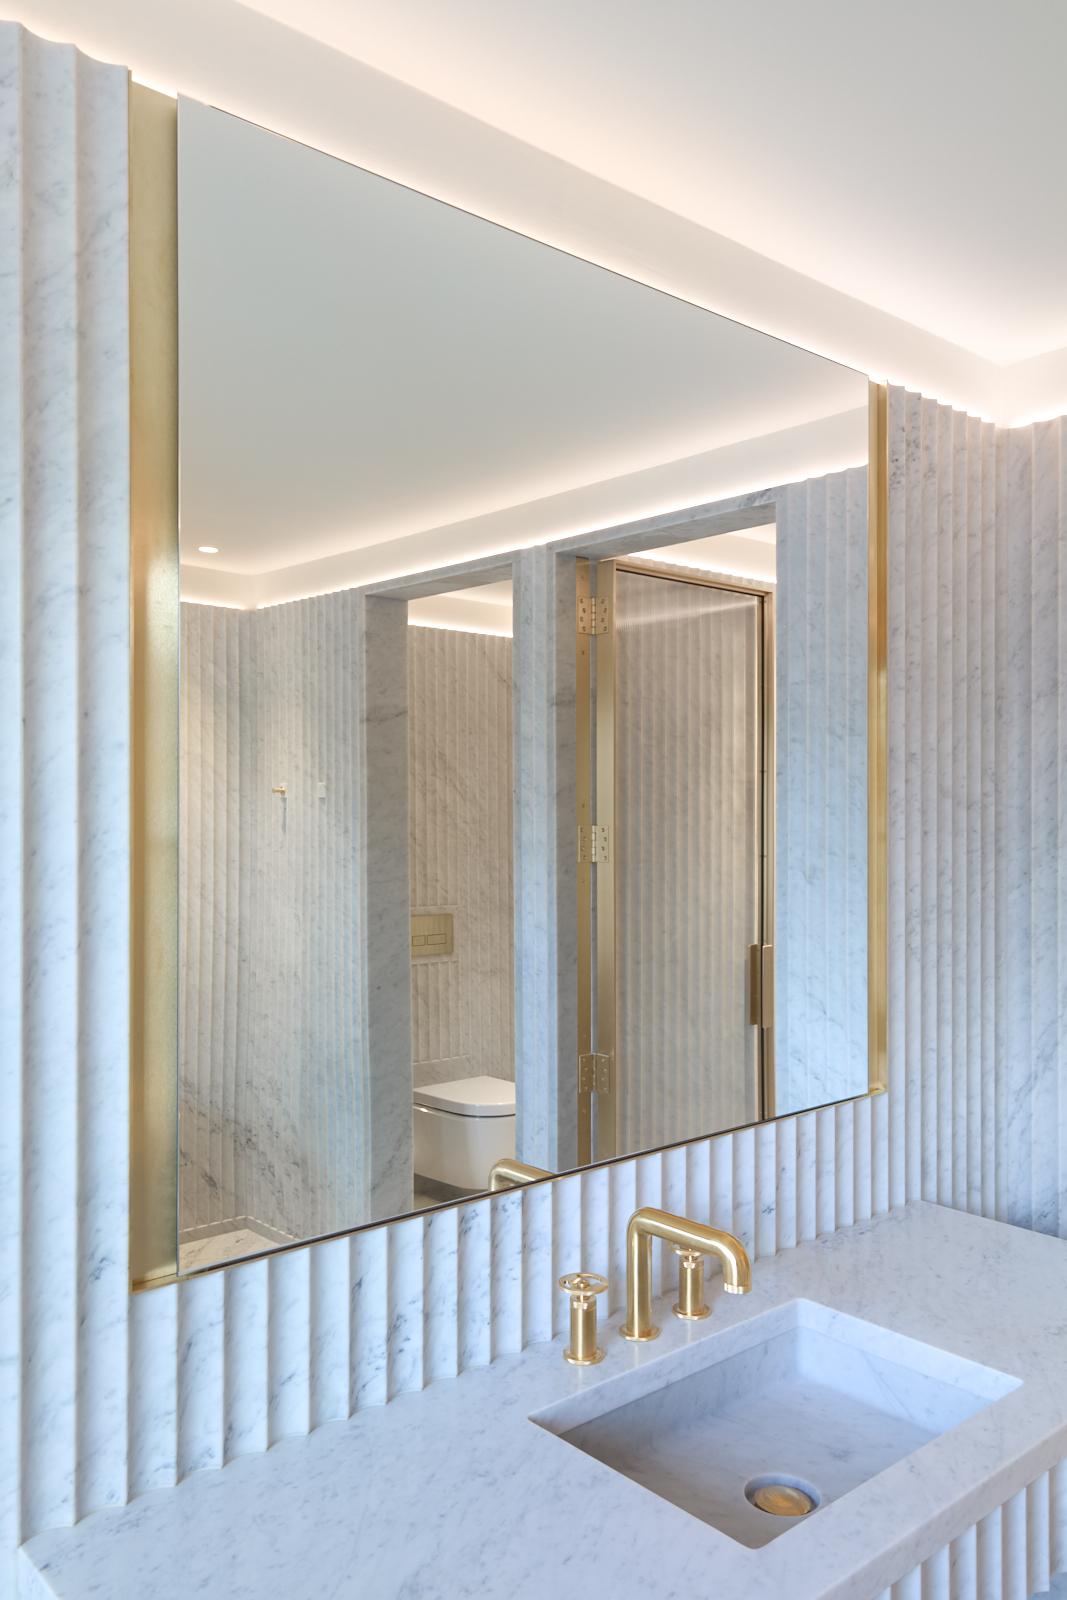 Gabriel Chipperfield, interior, bathroom, fluted marble